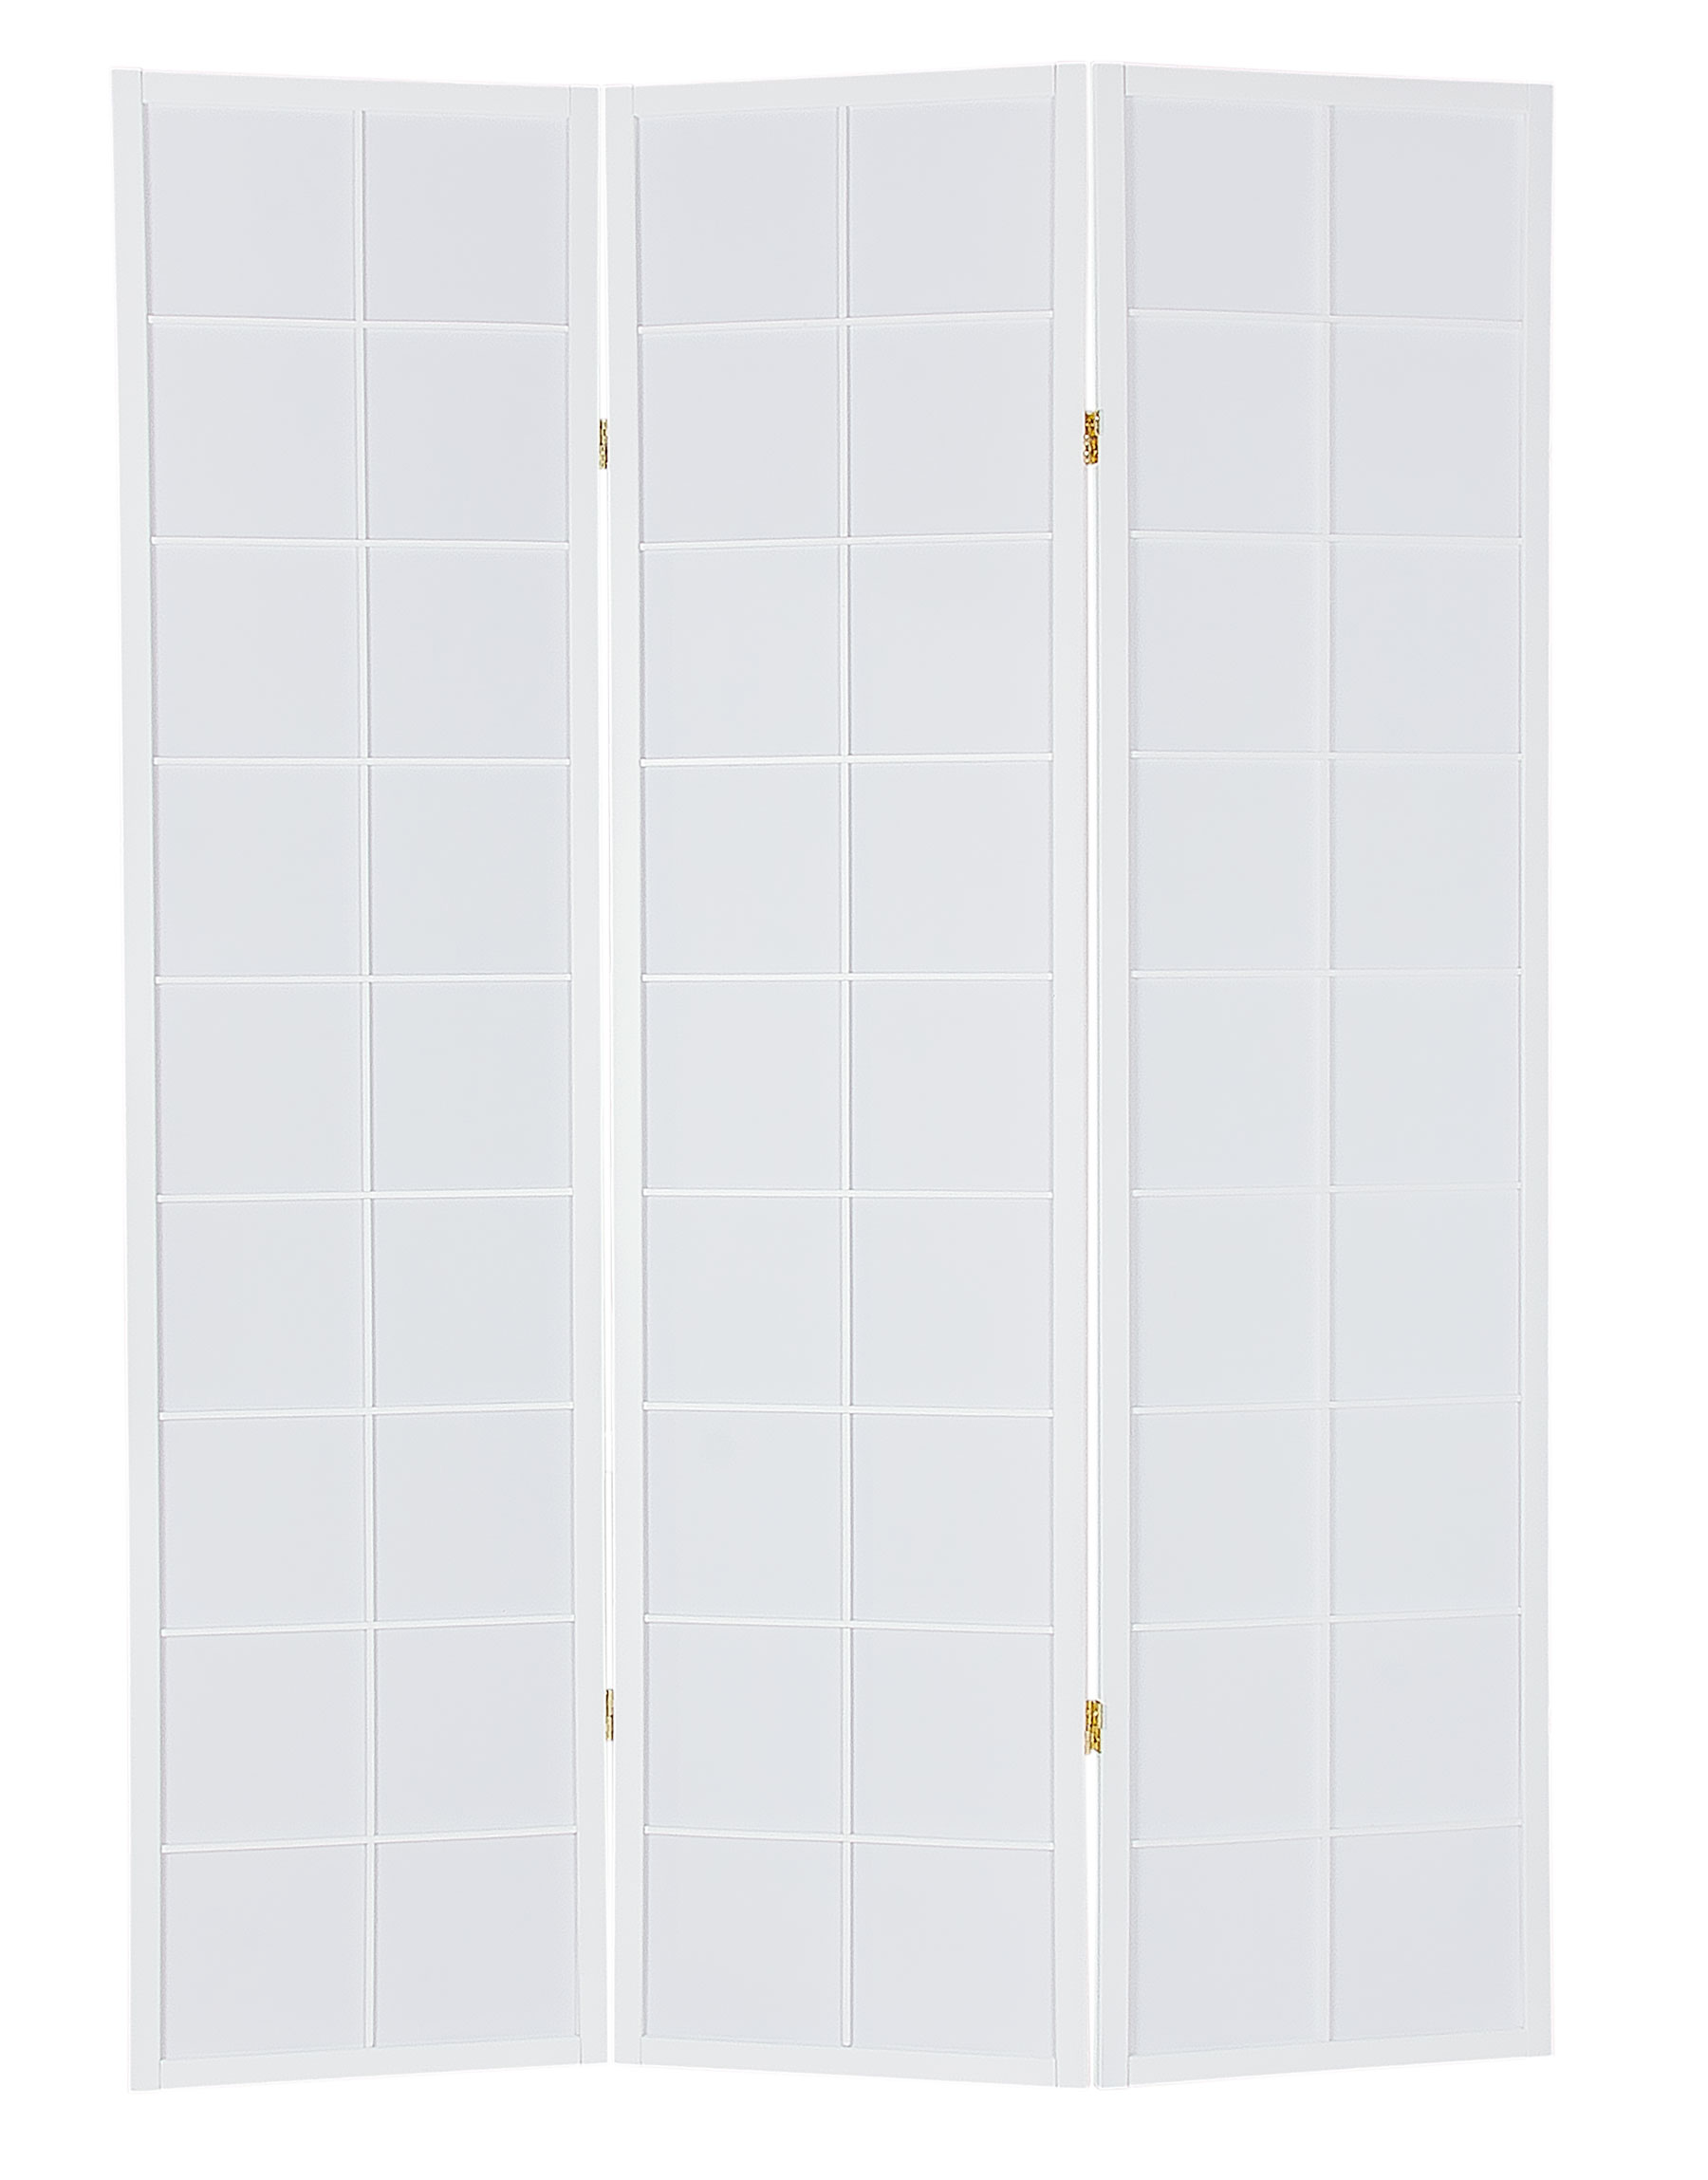 Декоративная ширма белого цвета (3-5 панелей)